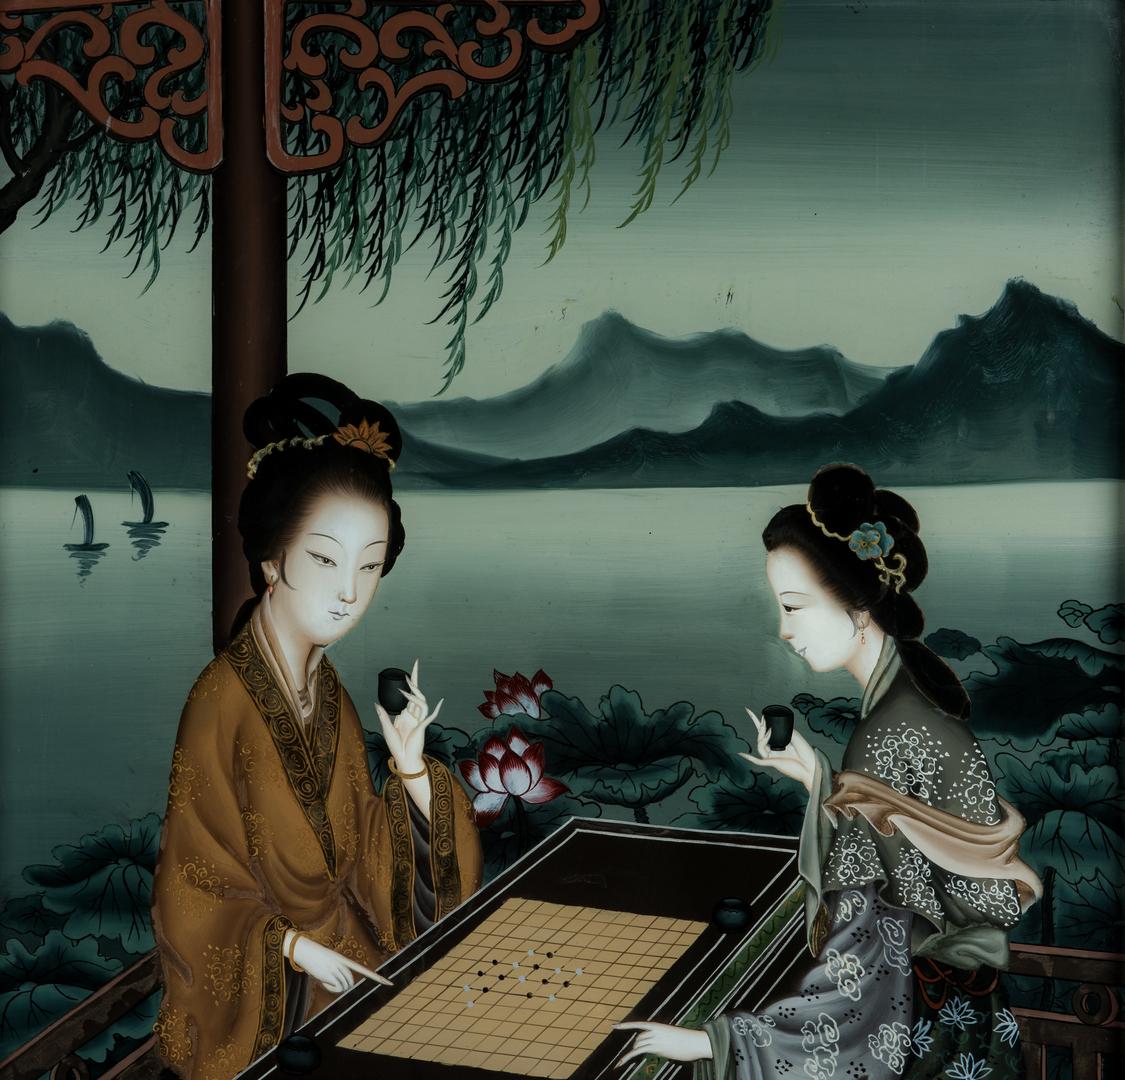 Lot 1004: 5 Asian Framed Items, inc. Monkeys, Geishas